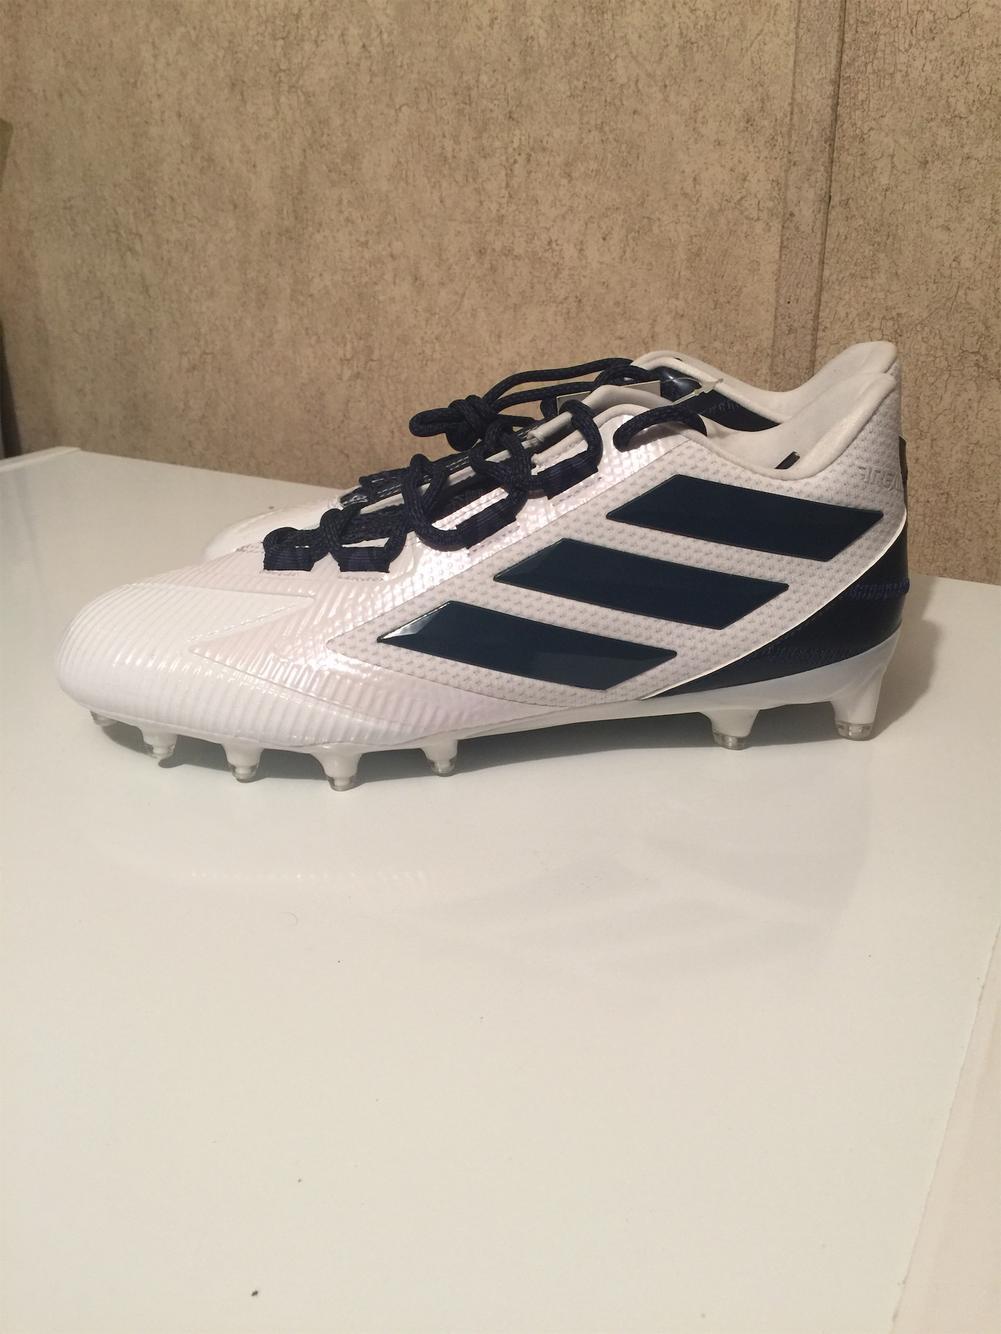 Adidas Mens Freak Carbon Low Football